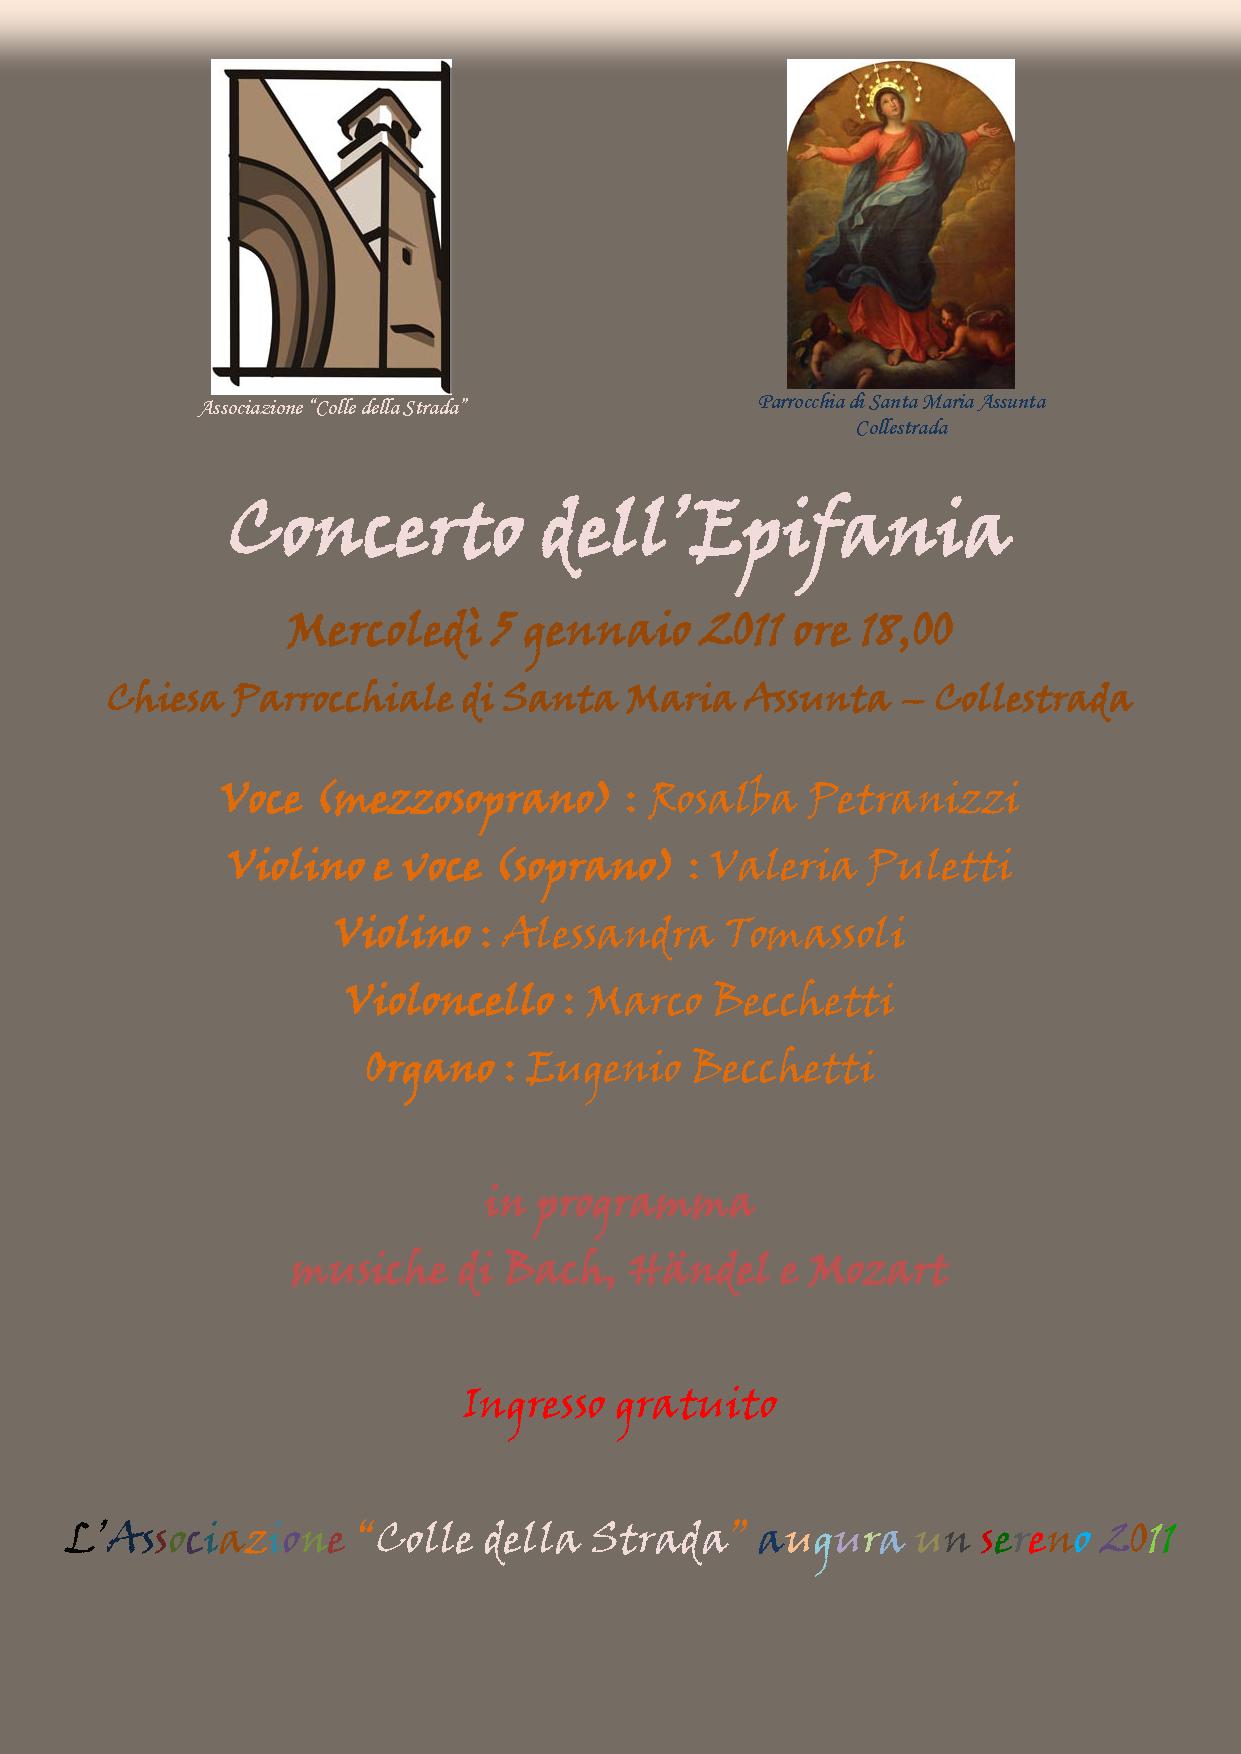 concerto_2011